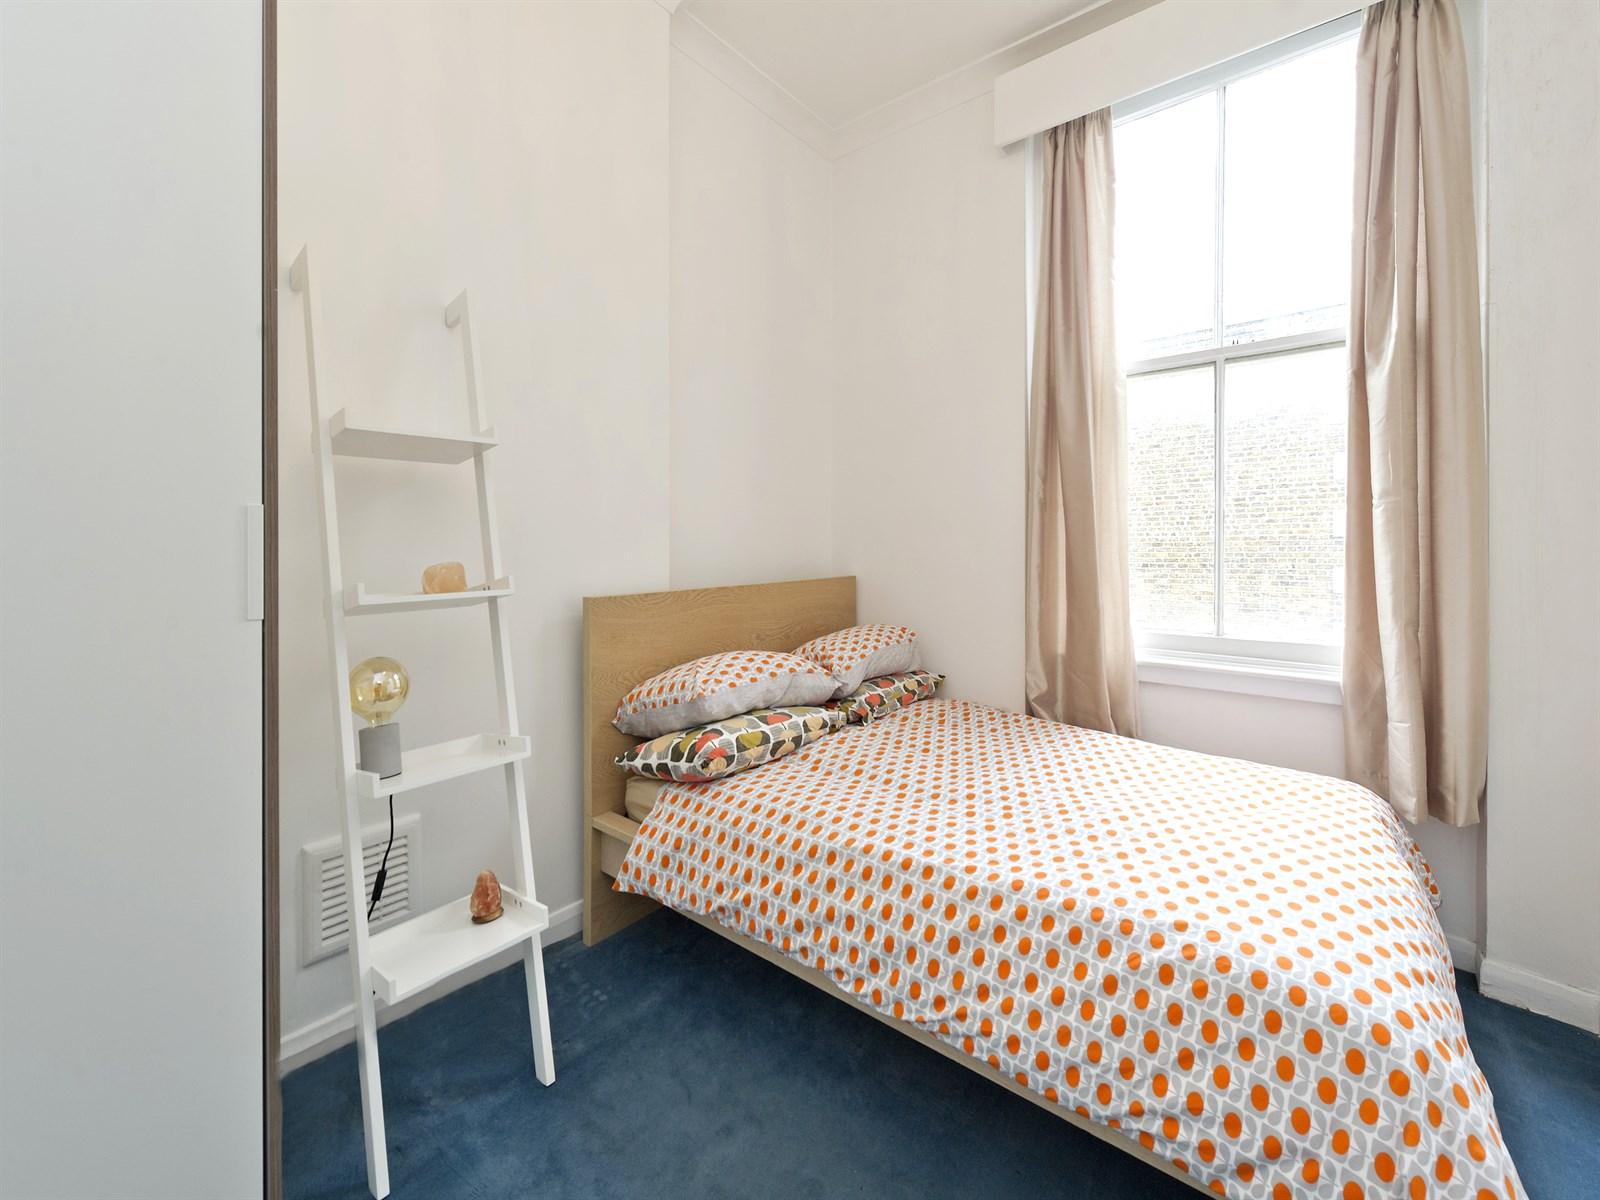 2 bedroom North Kensington flat for sale - Ladbroke Grove, W10